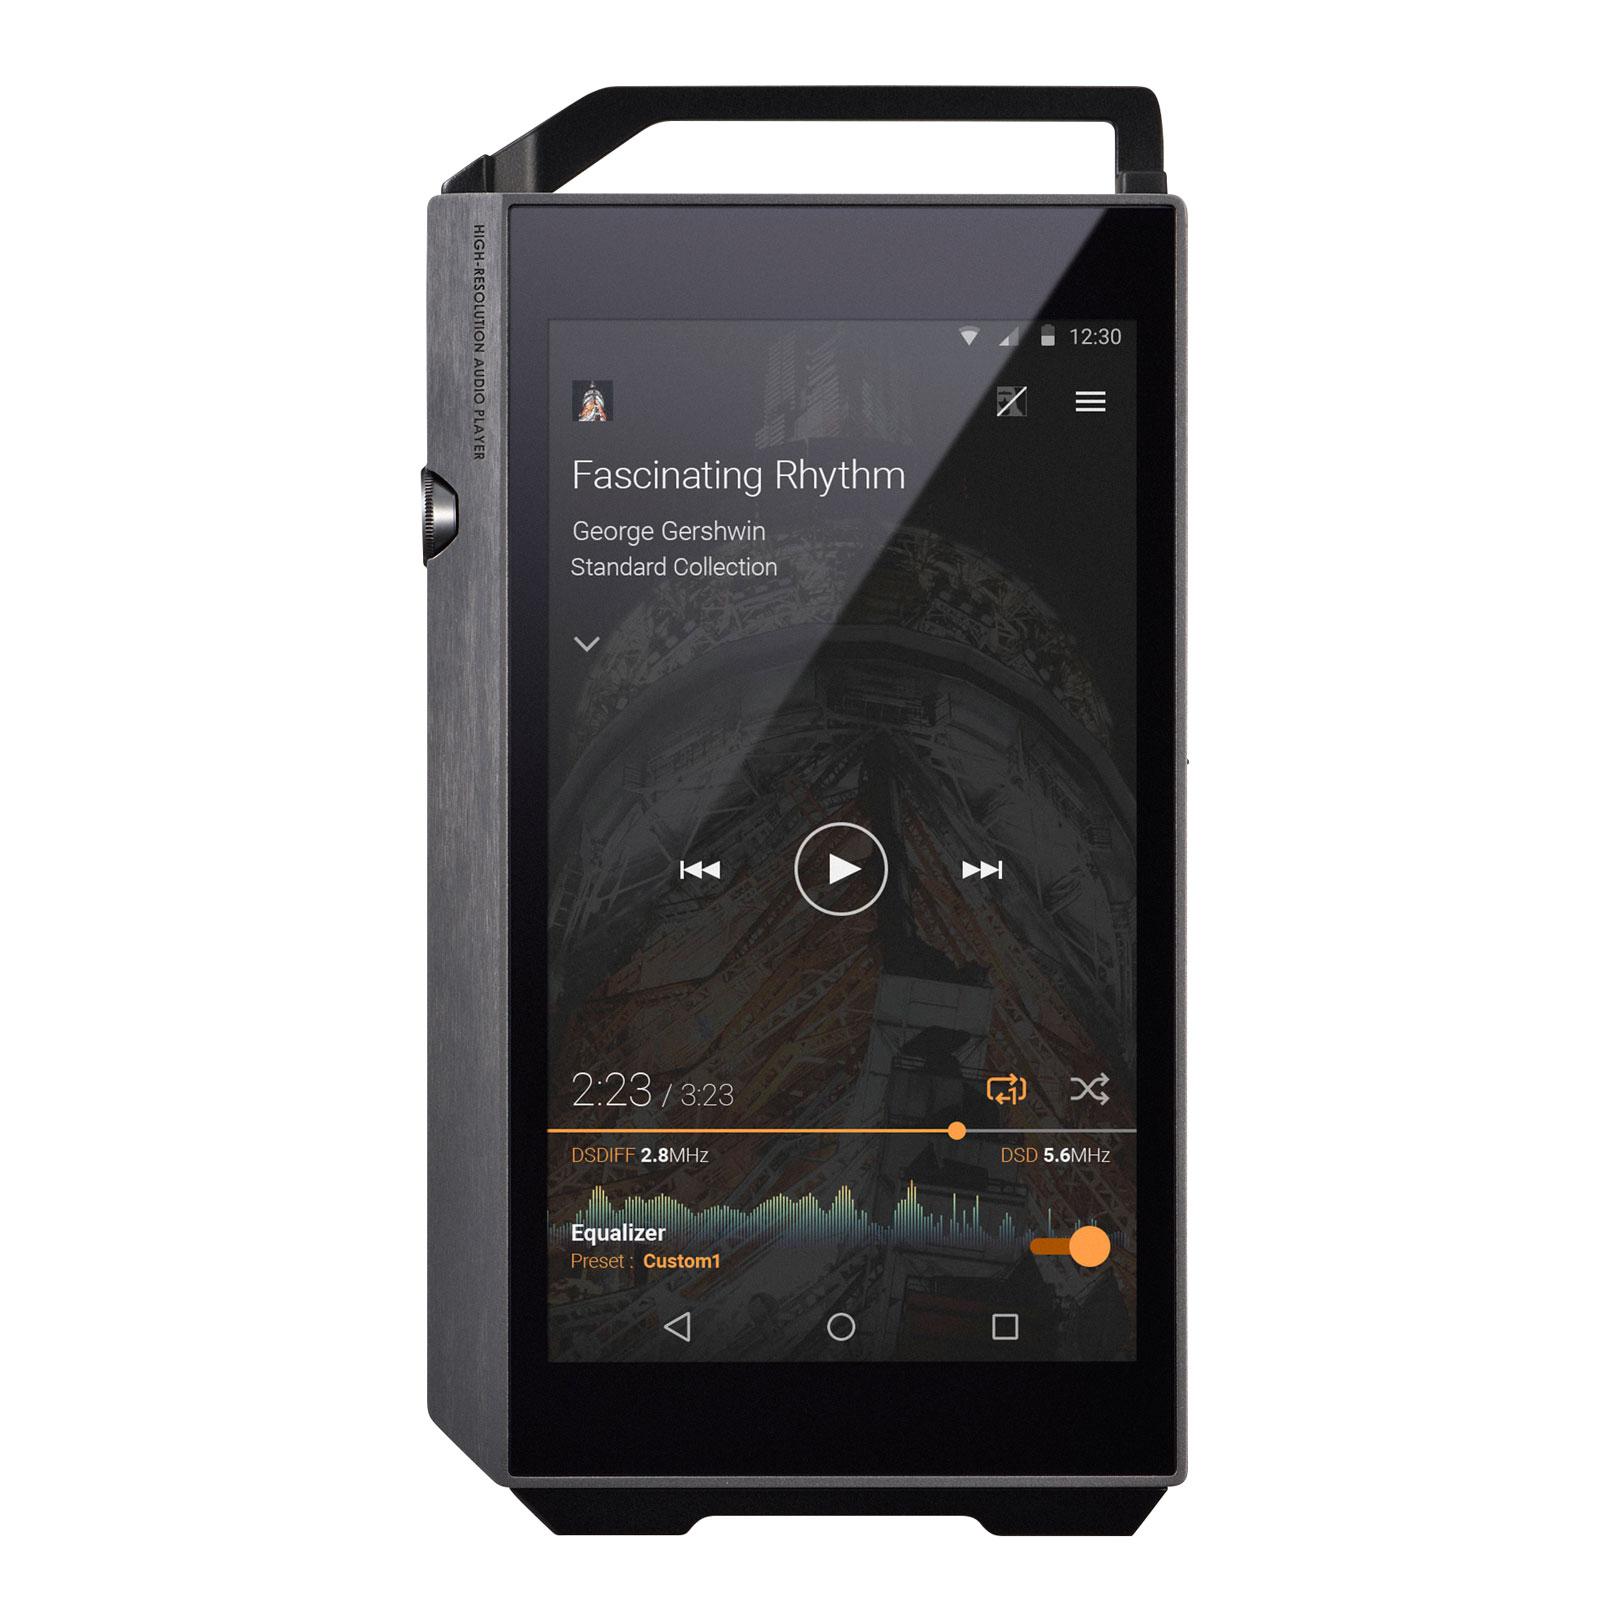 Pioneer XDP-100R Noir - Lecteur MP3 & iPod Pioneer sur